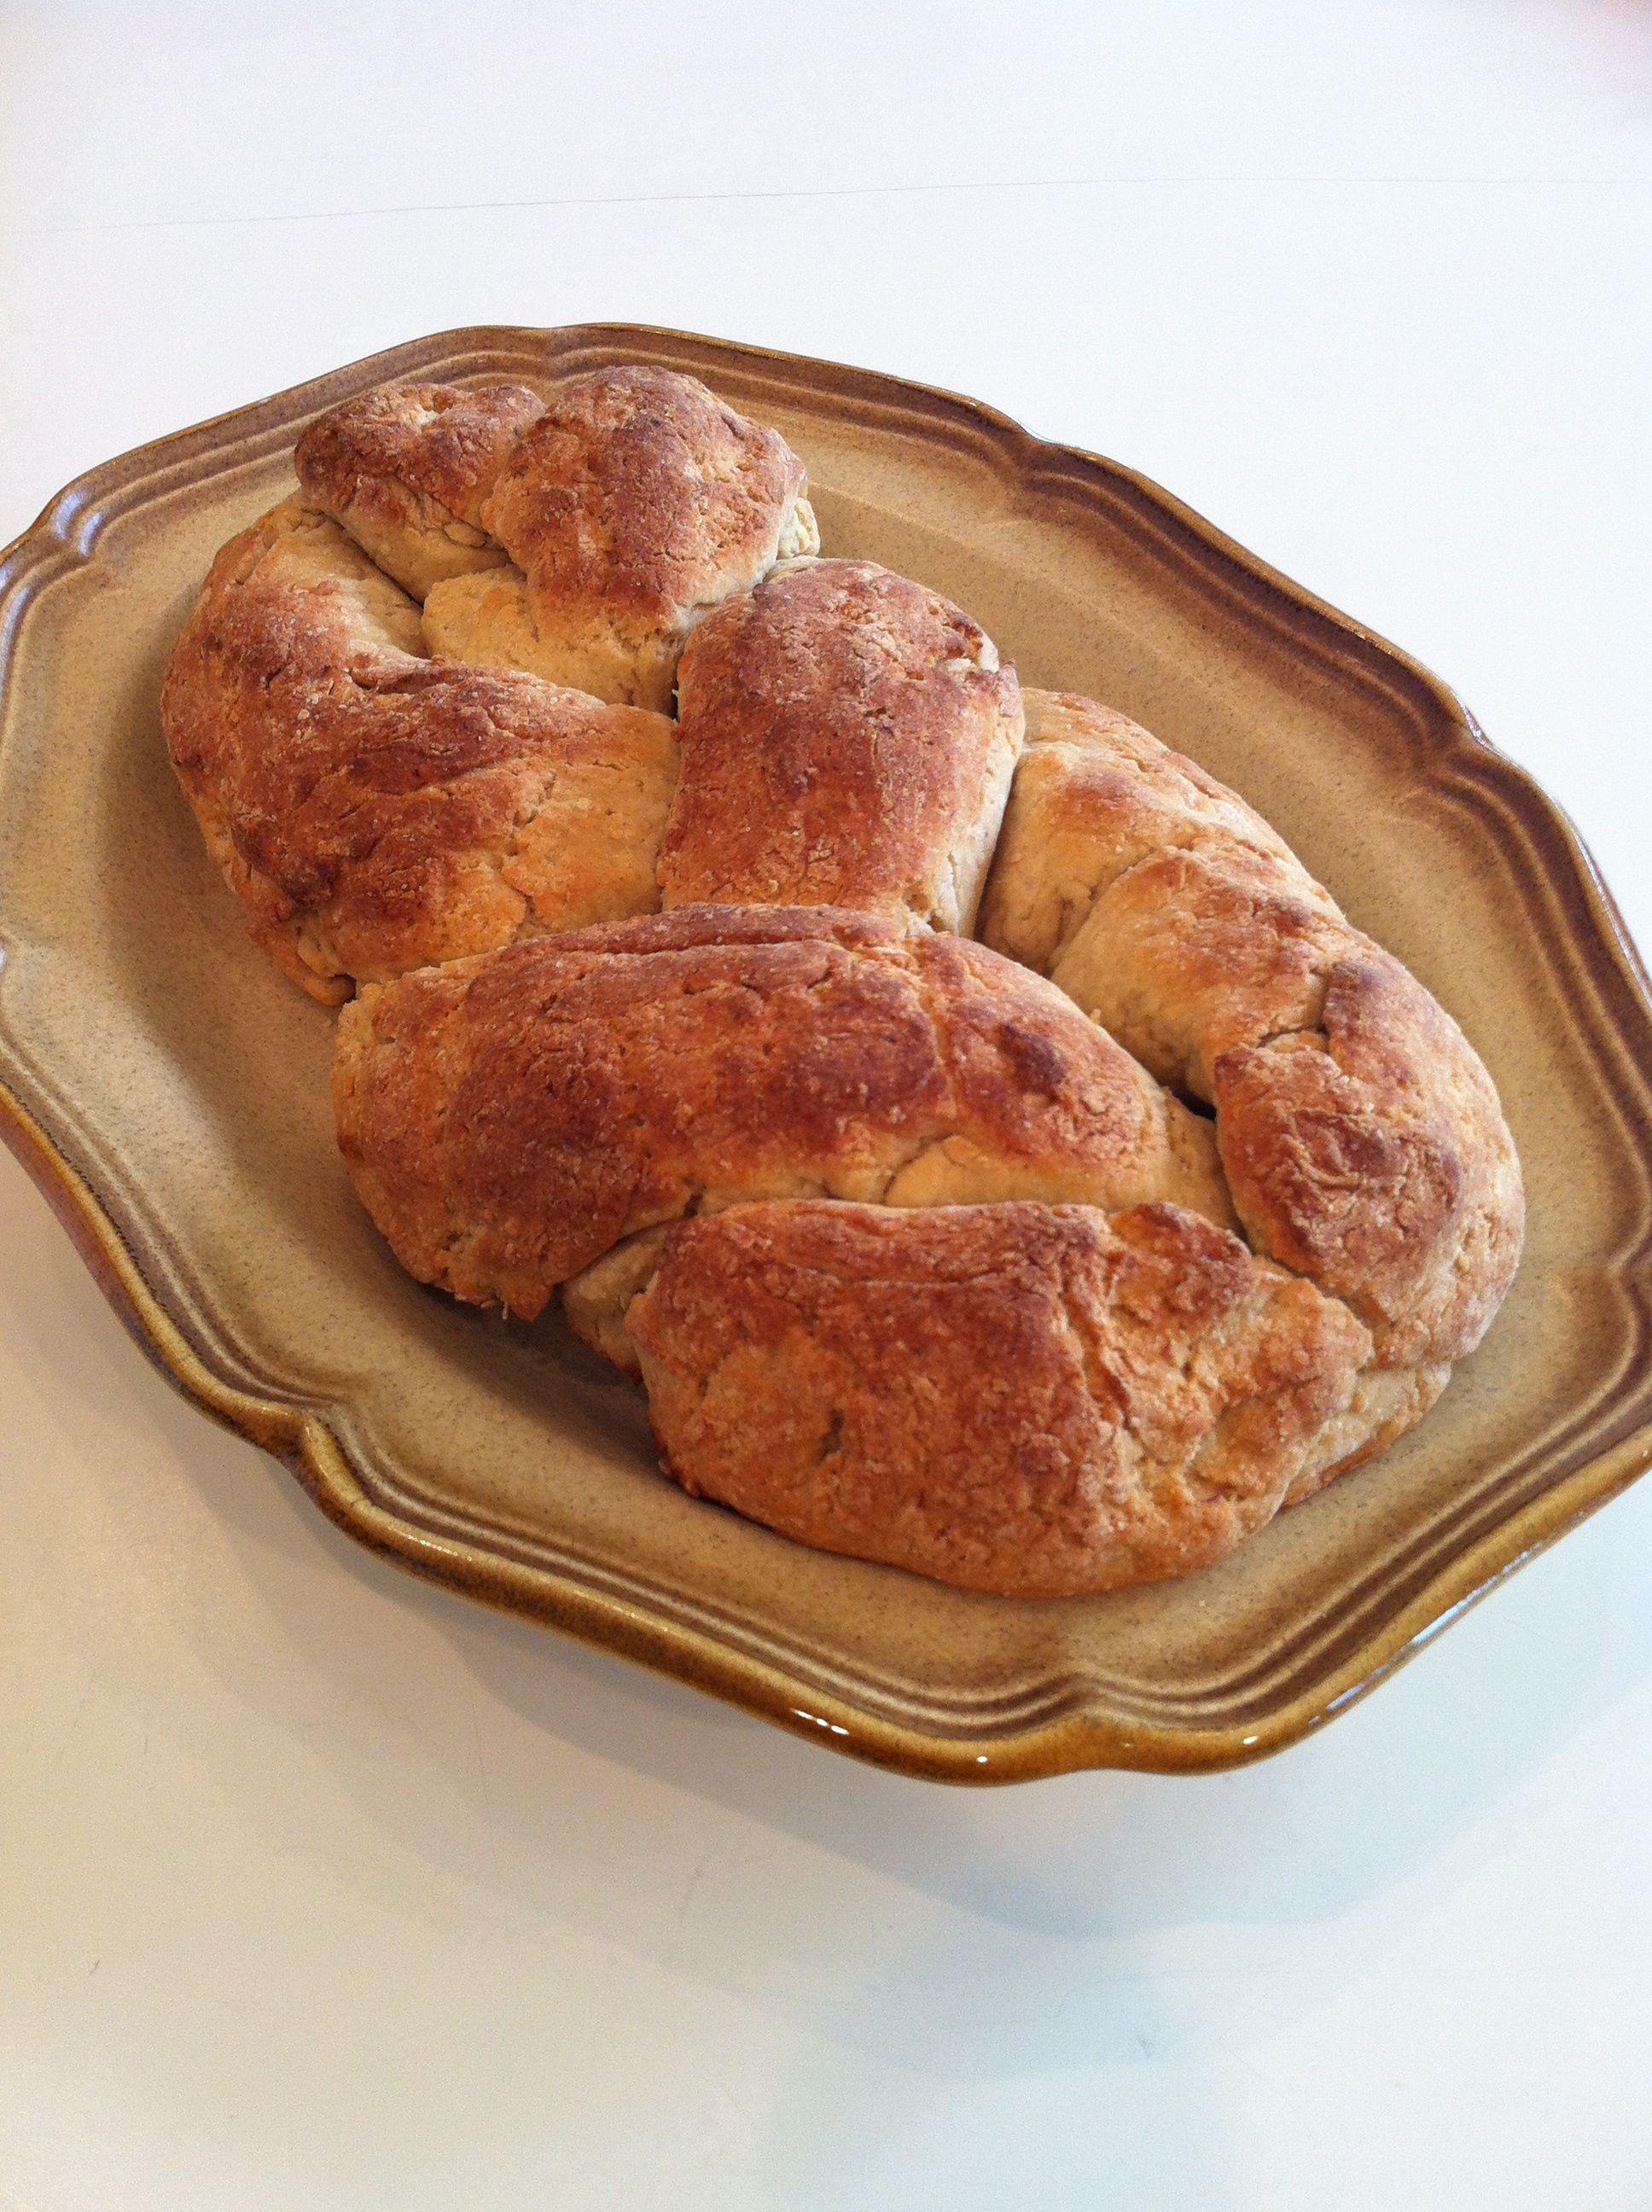 Glutenfree vegan challah bread recipe my dairyfree